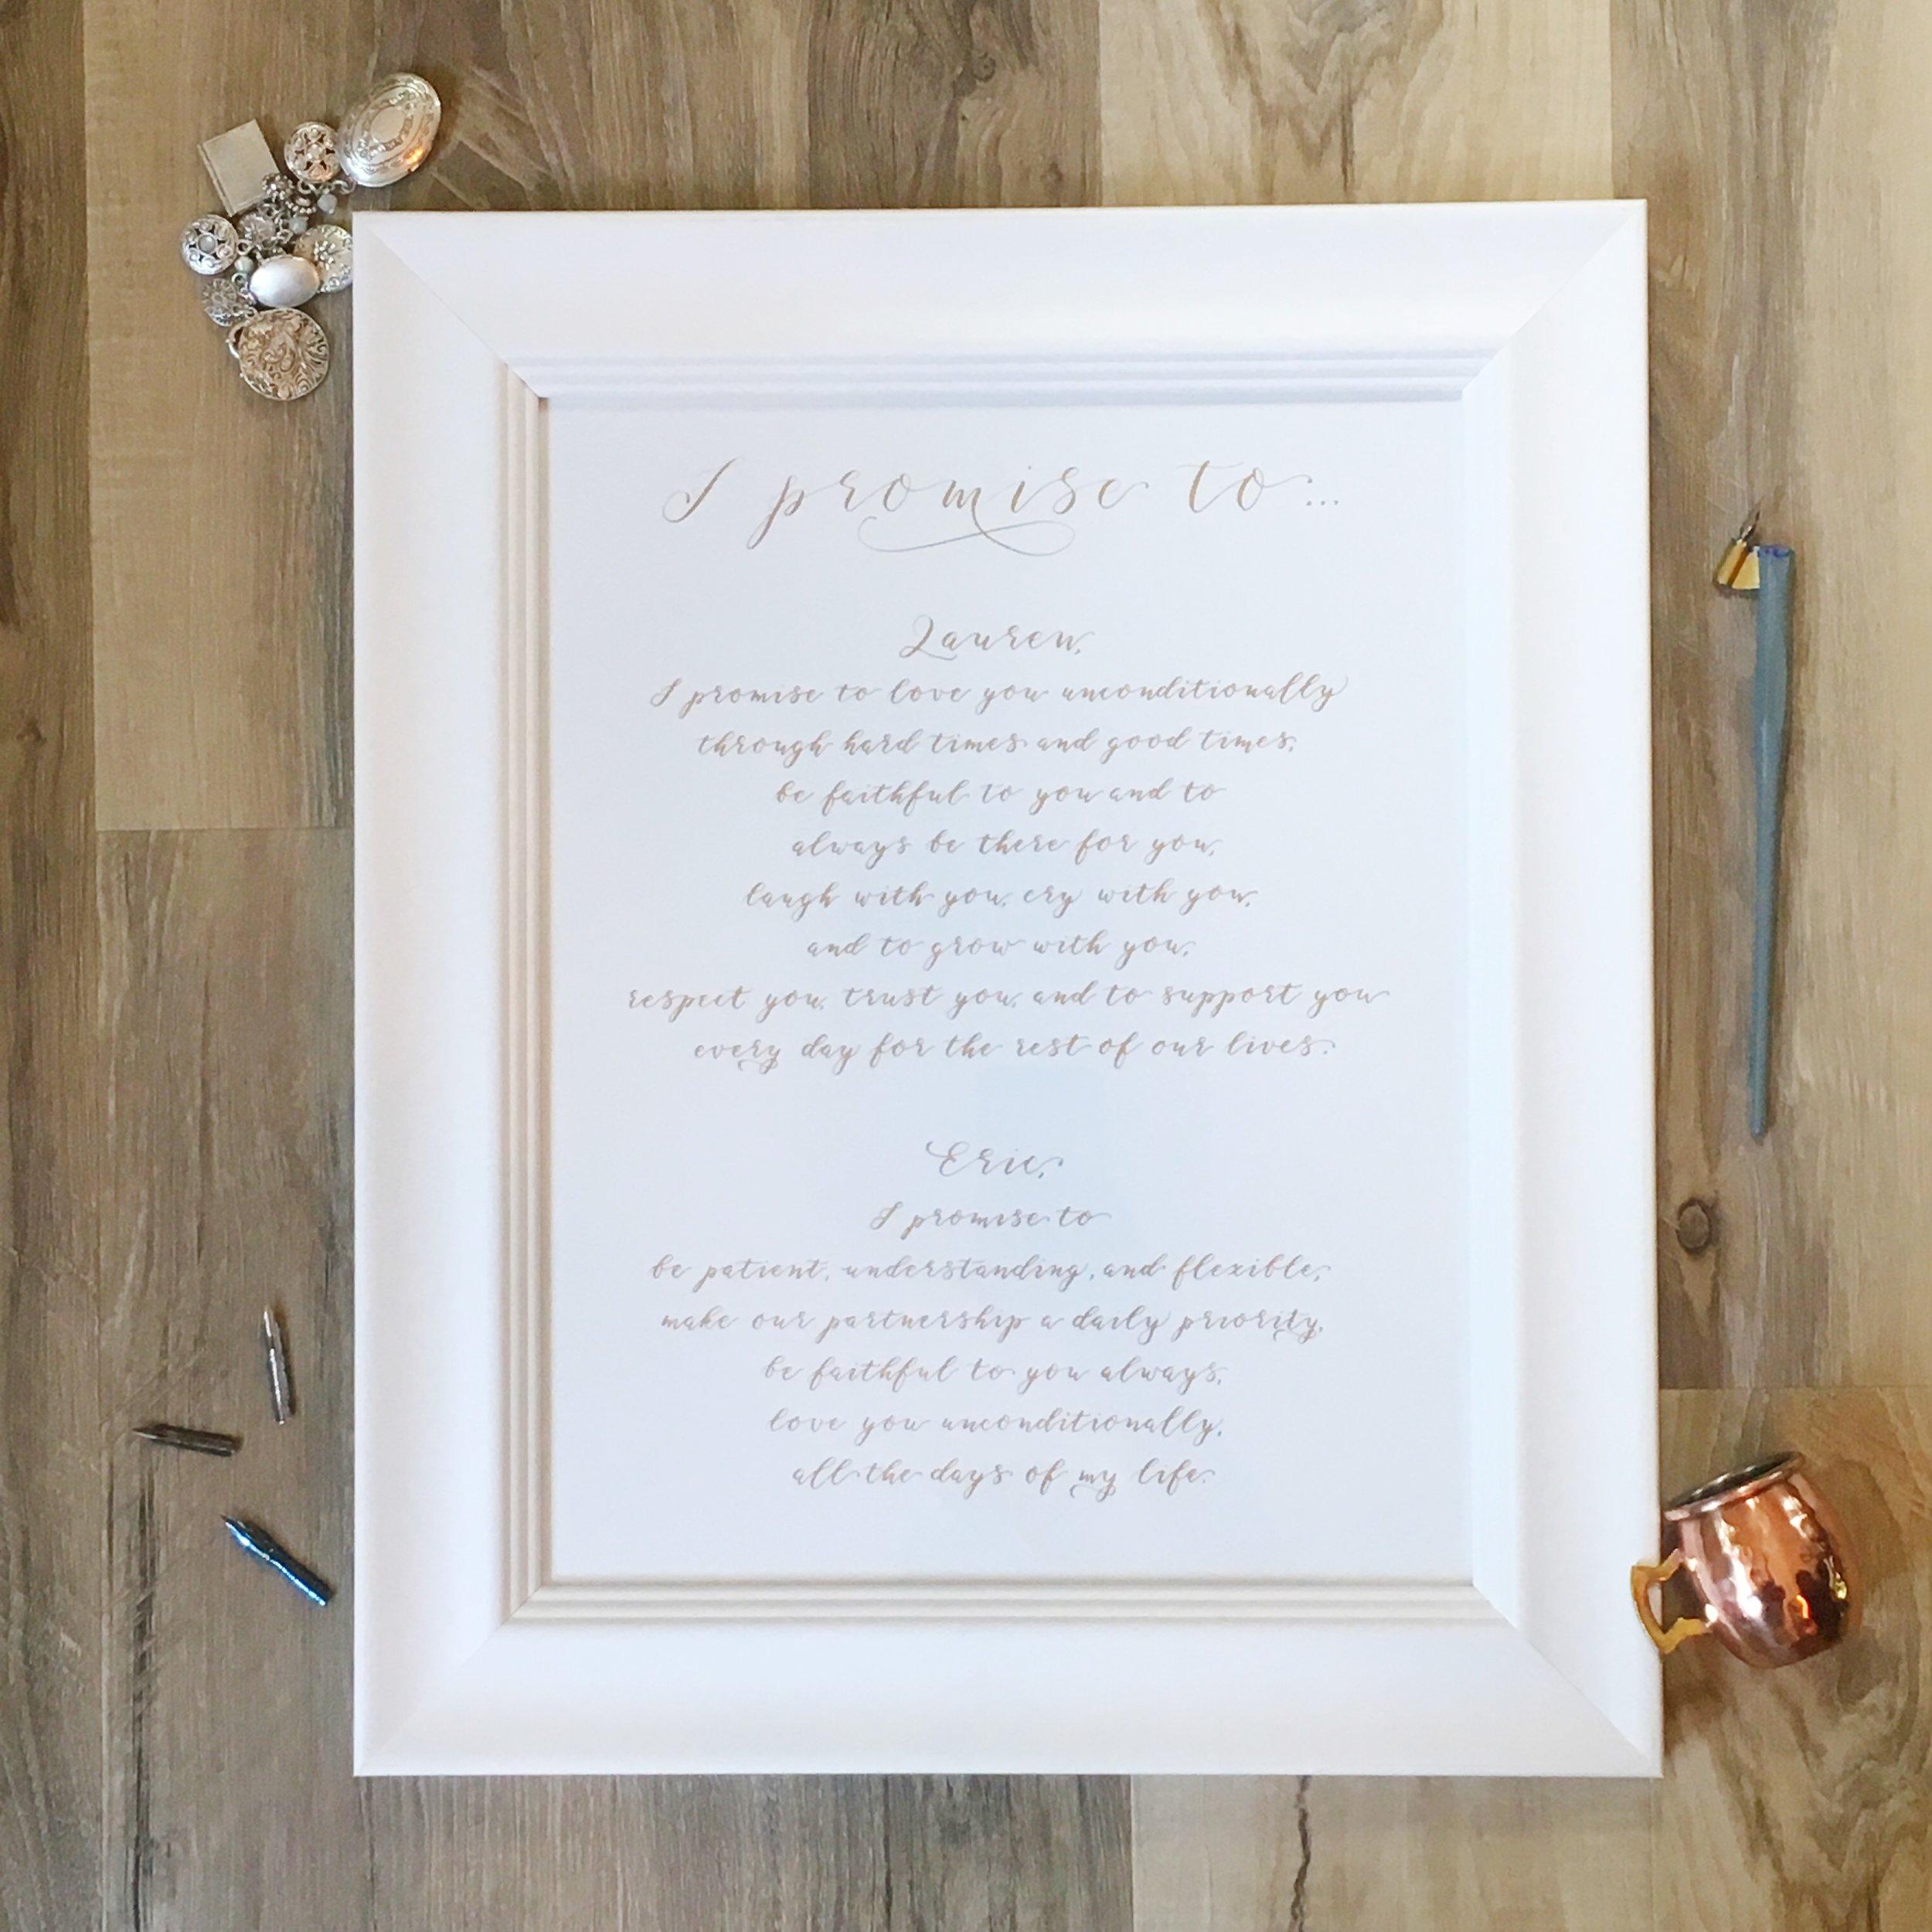 Central PA, York PA, JesSmith Designs, custom, wedding, invitations, bridal, announcements, save the date, birth, baby, motherhood, hanover, calligraphy, handlettering, wedding invitations, lancaster, gettysburg-07-18 19.40.53.jpg